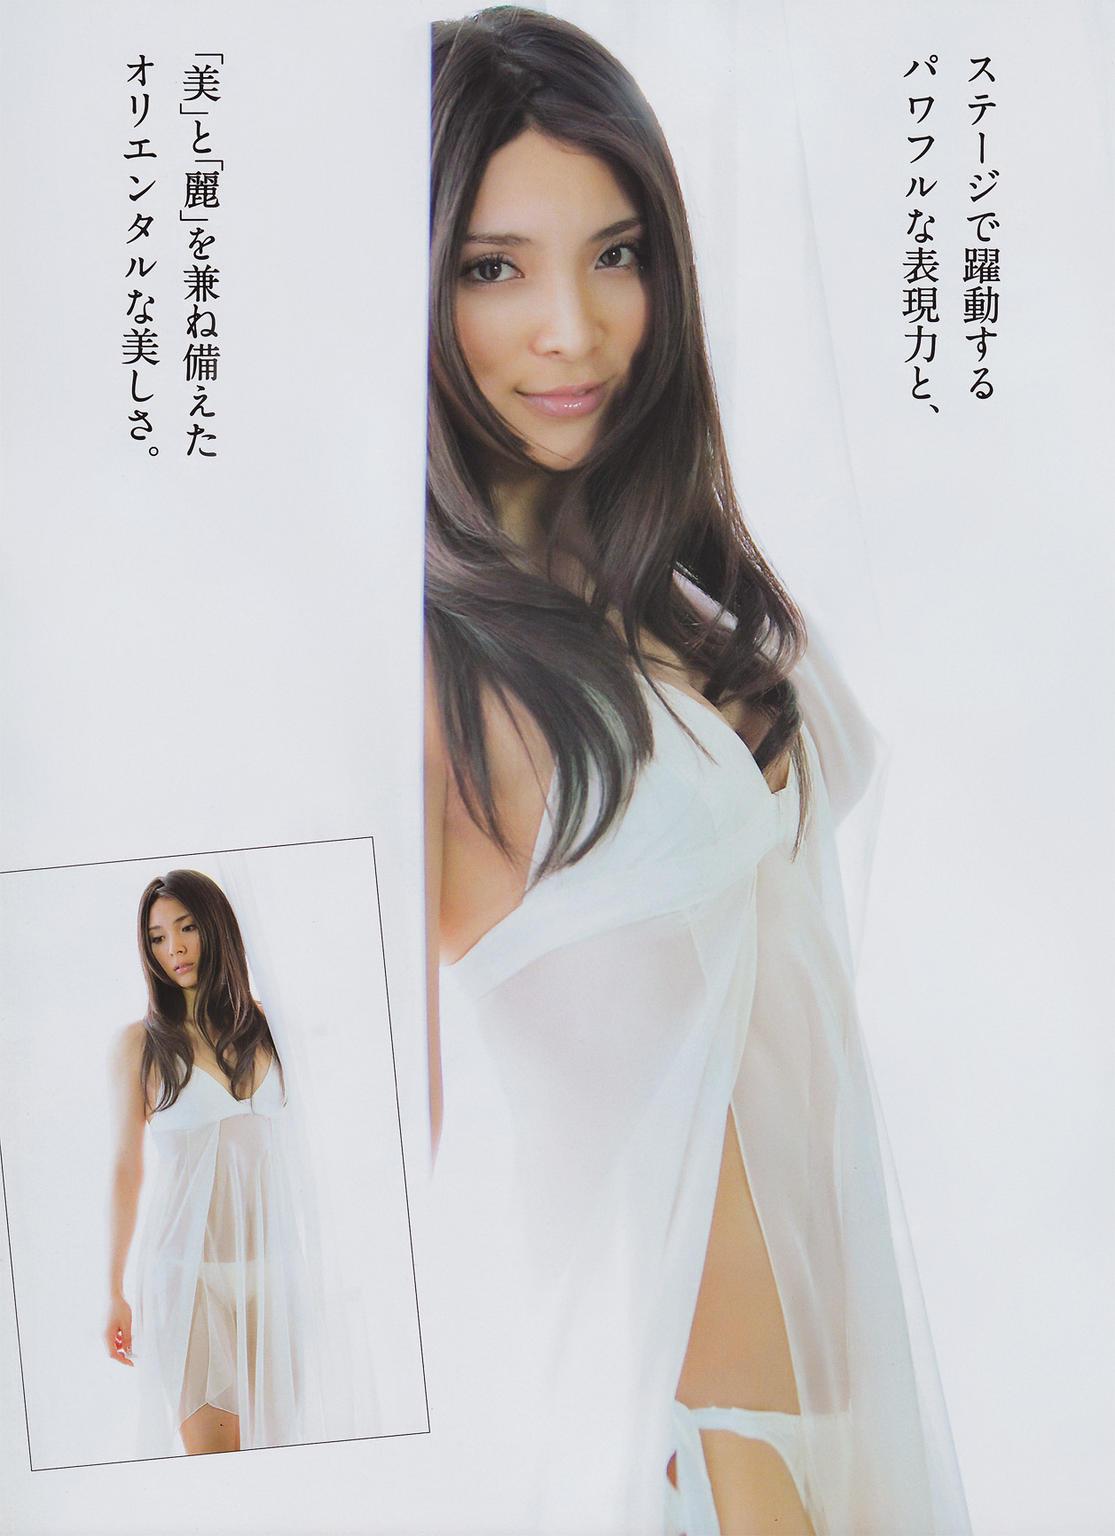 pictures Sayaka Akimoto